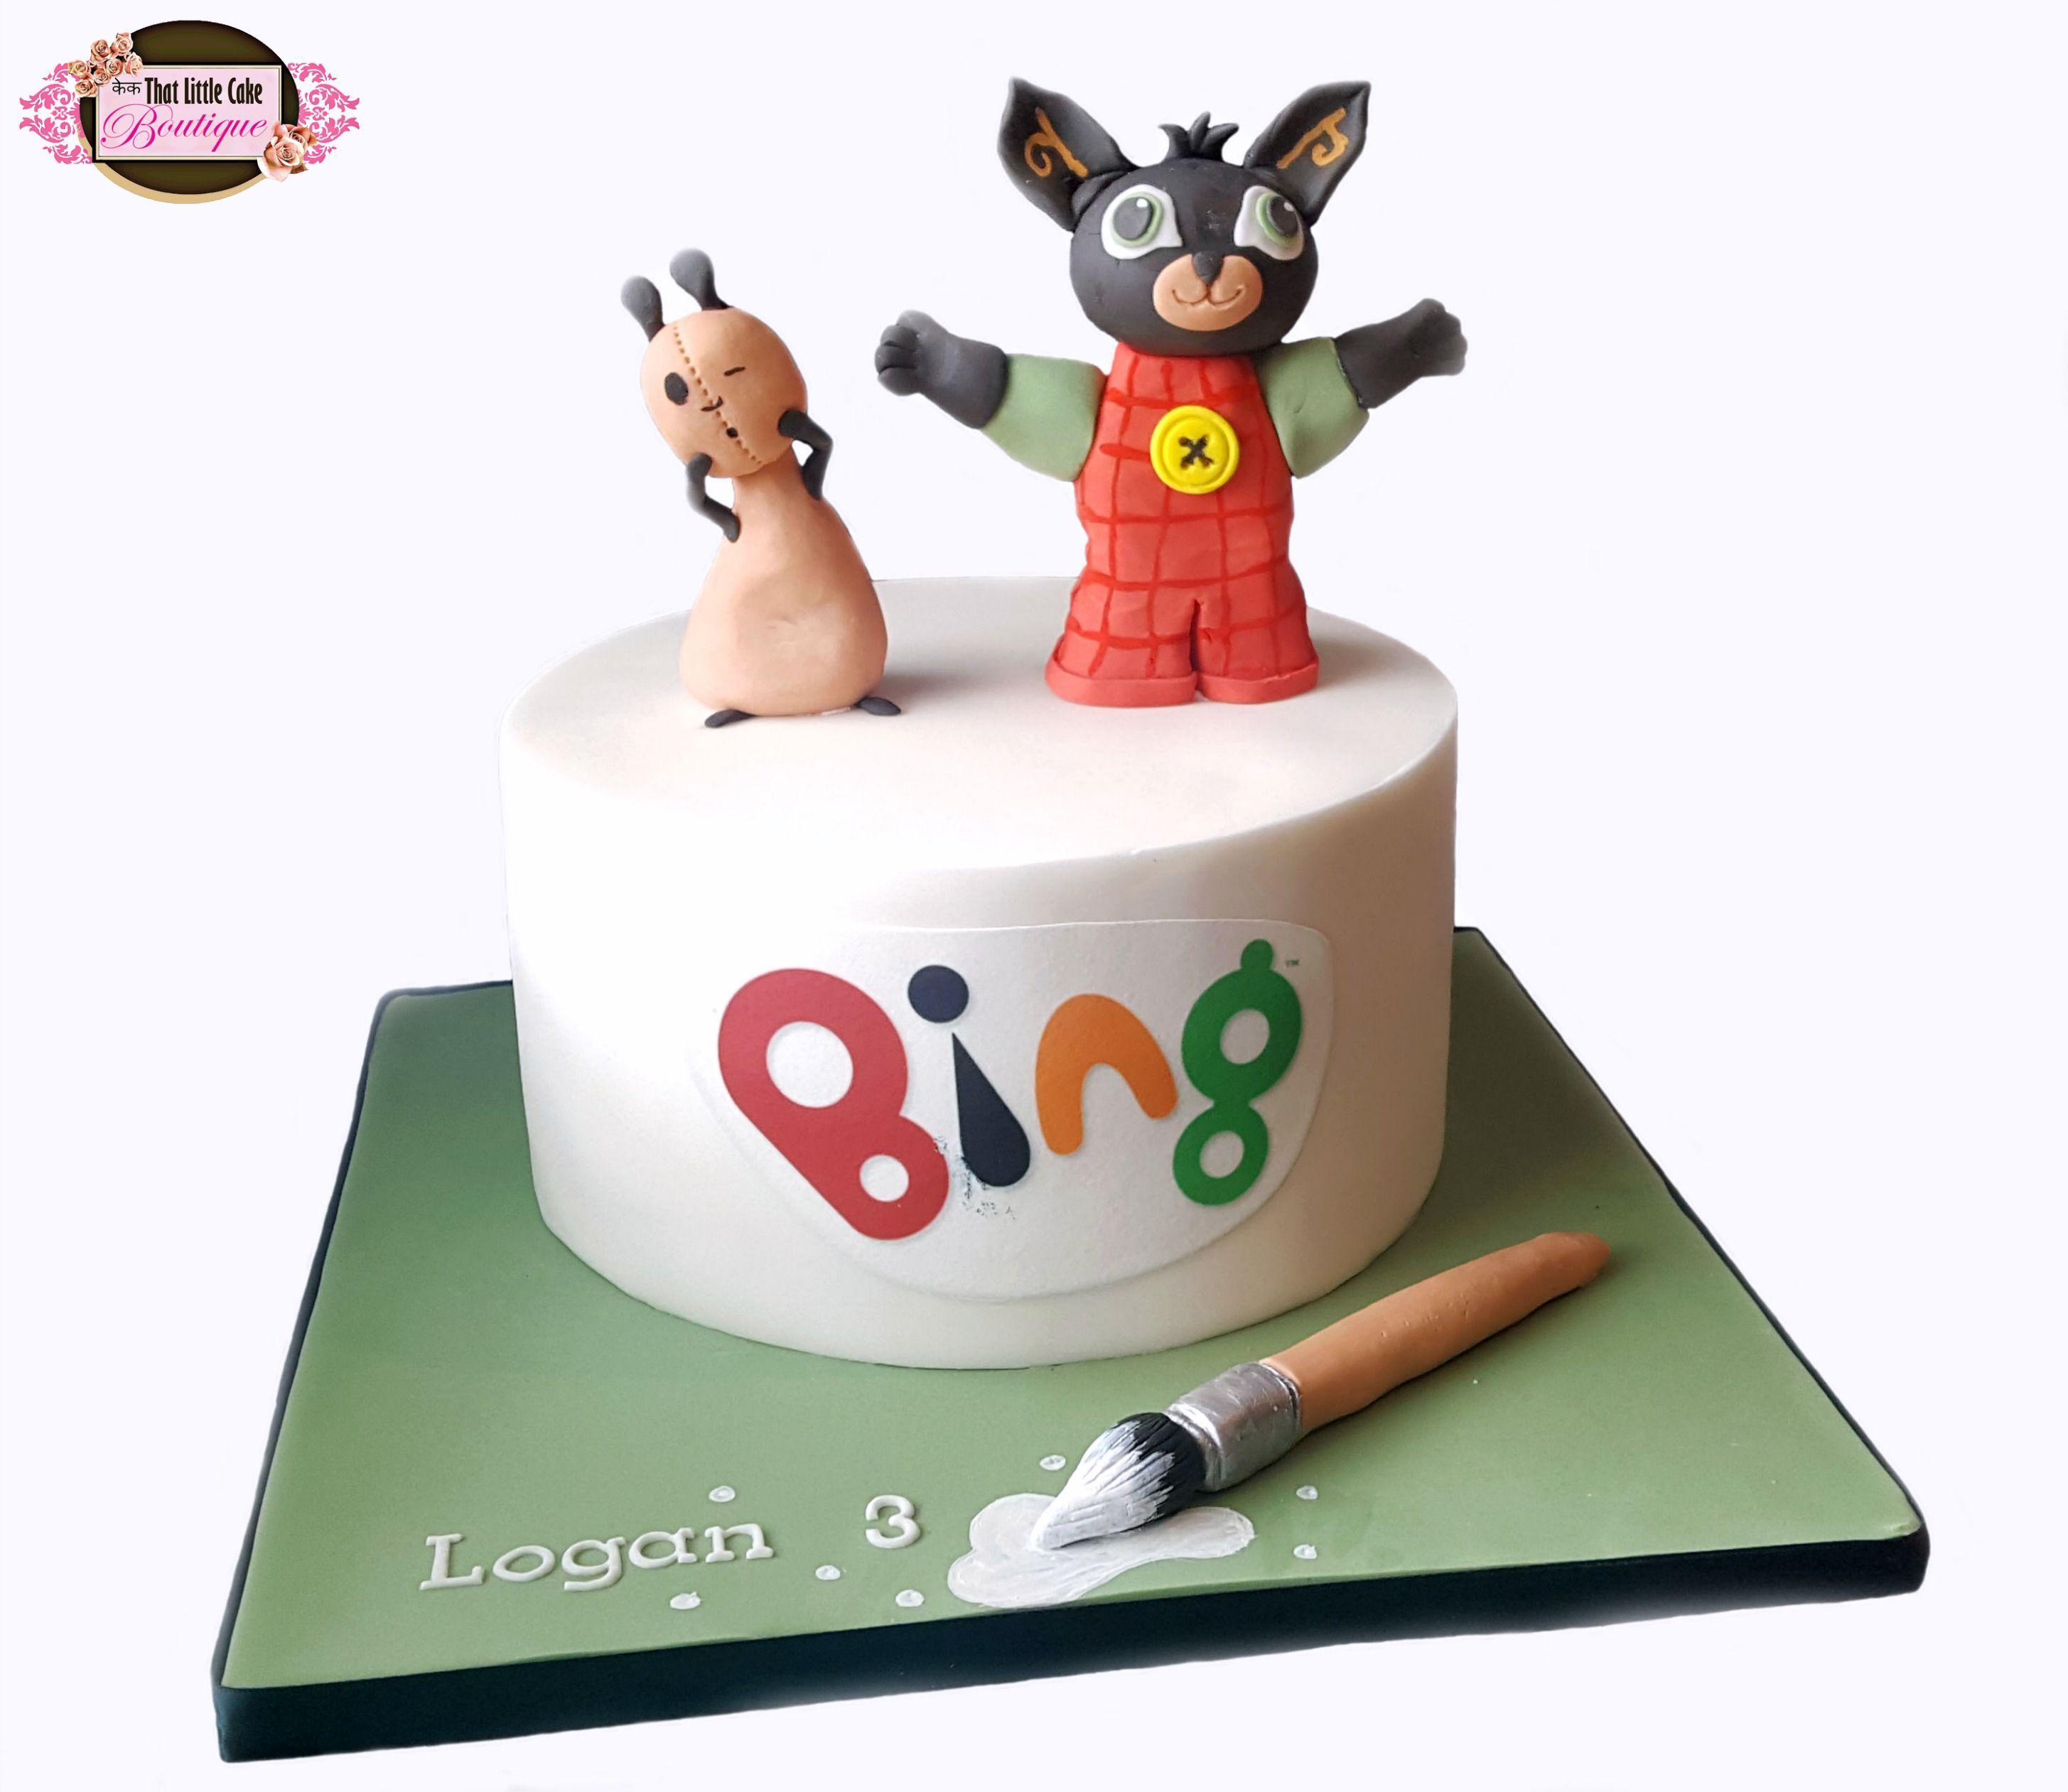 Bing Cake Cake Bing Paintbrush Cbeebies Round One Tier 3d